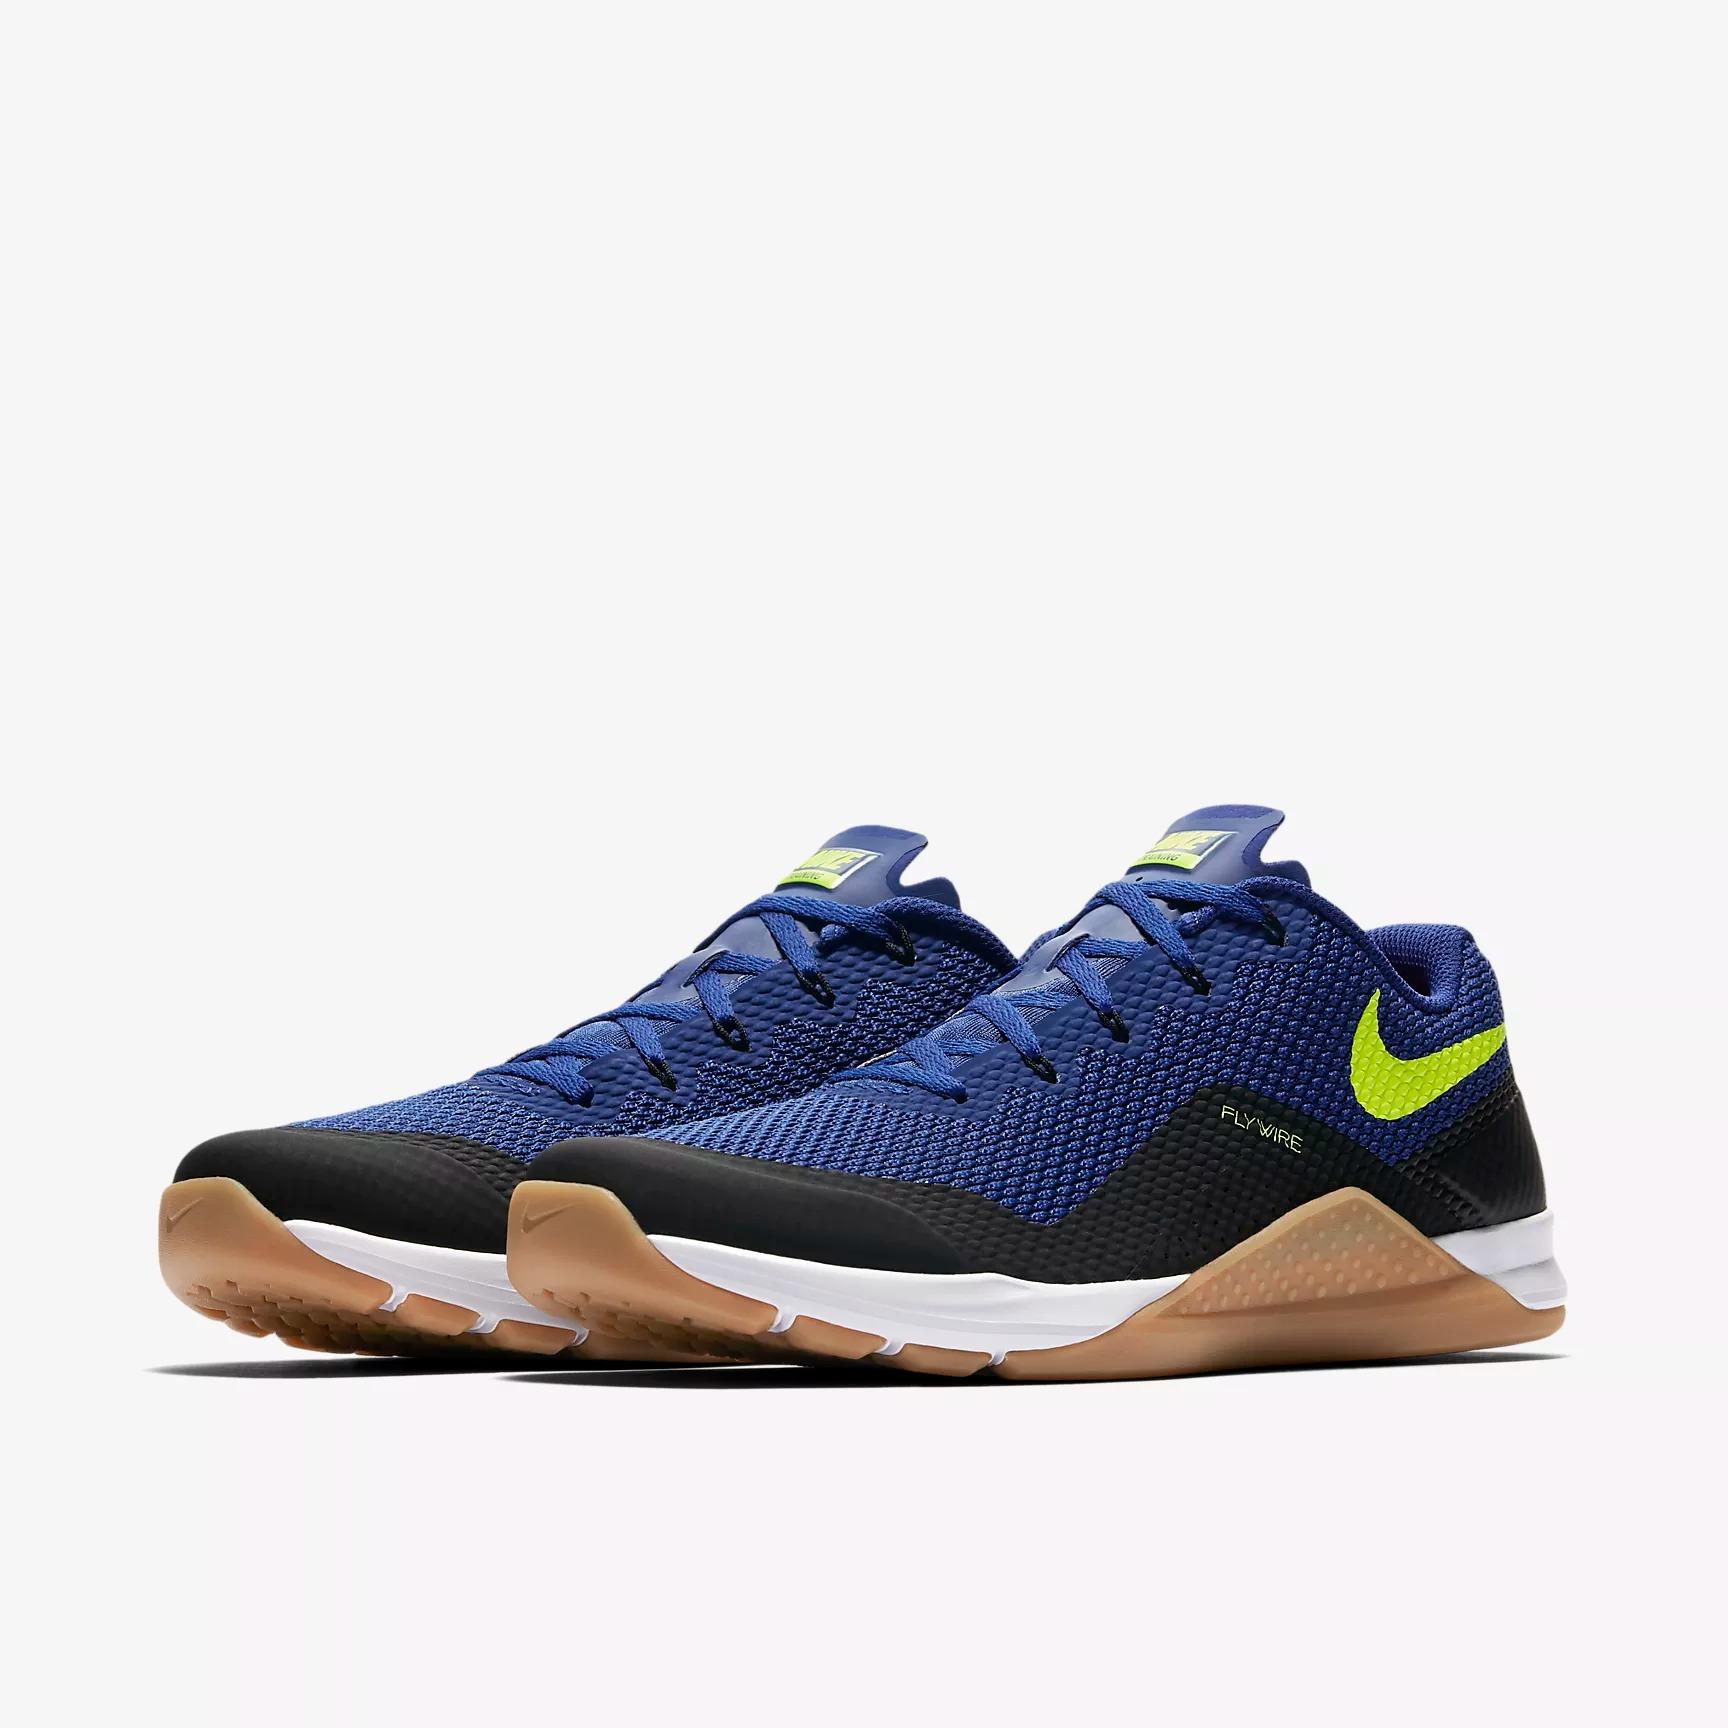 a1c6f4db4a3 Nike Metcon Repper DSX Training Shoes - SPORT SHOES TRAINING SHOES -  Superfanas.lt